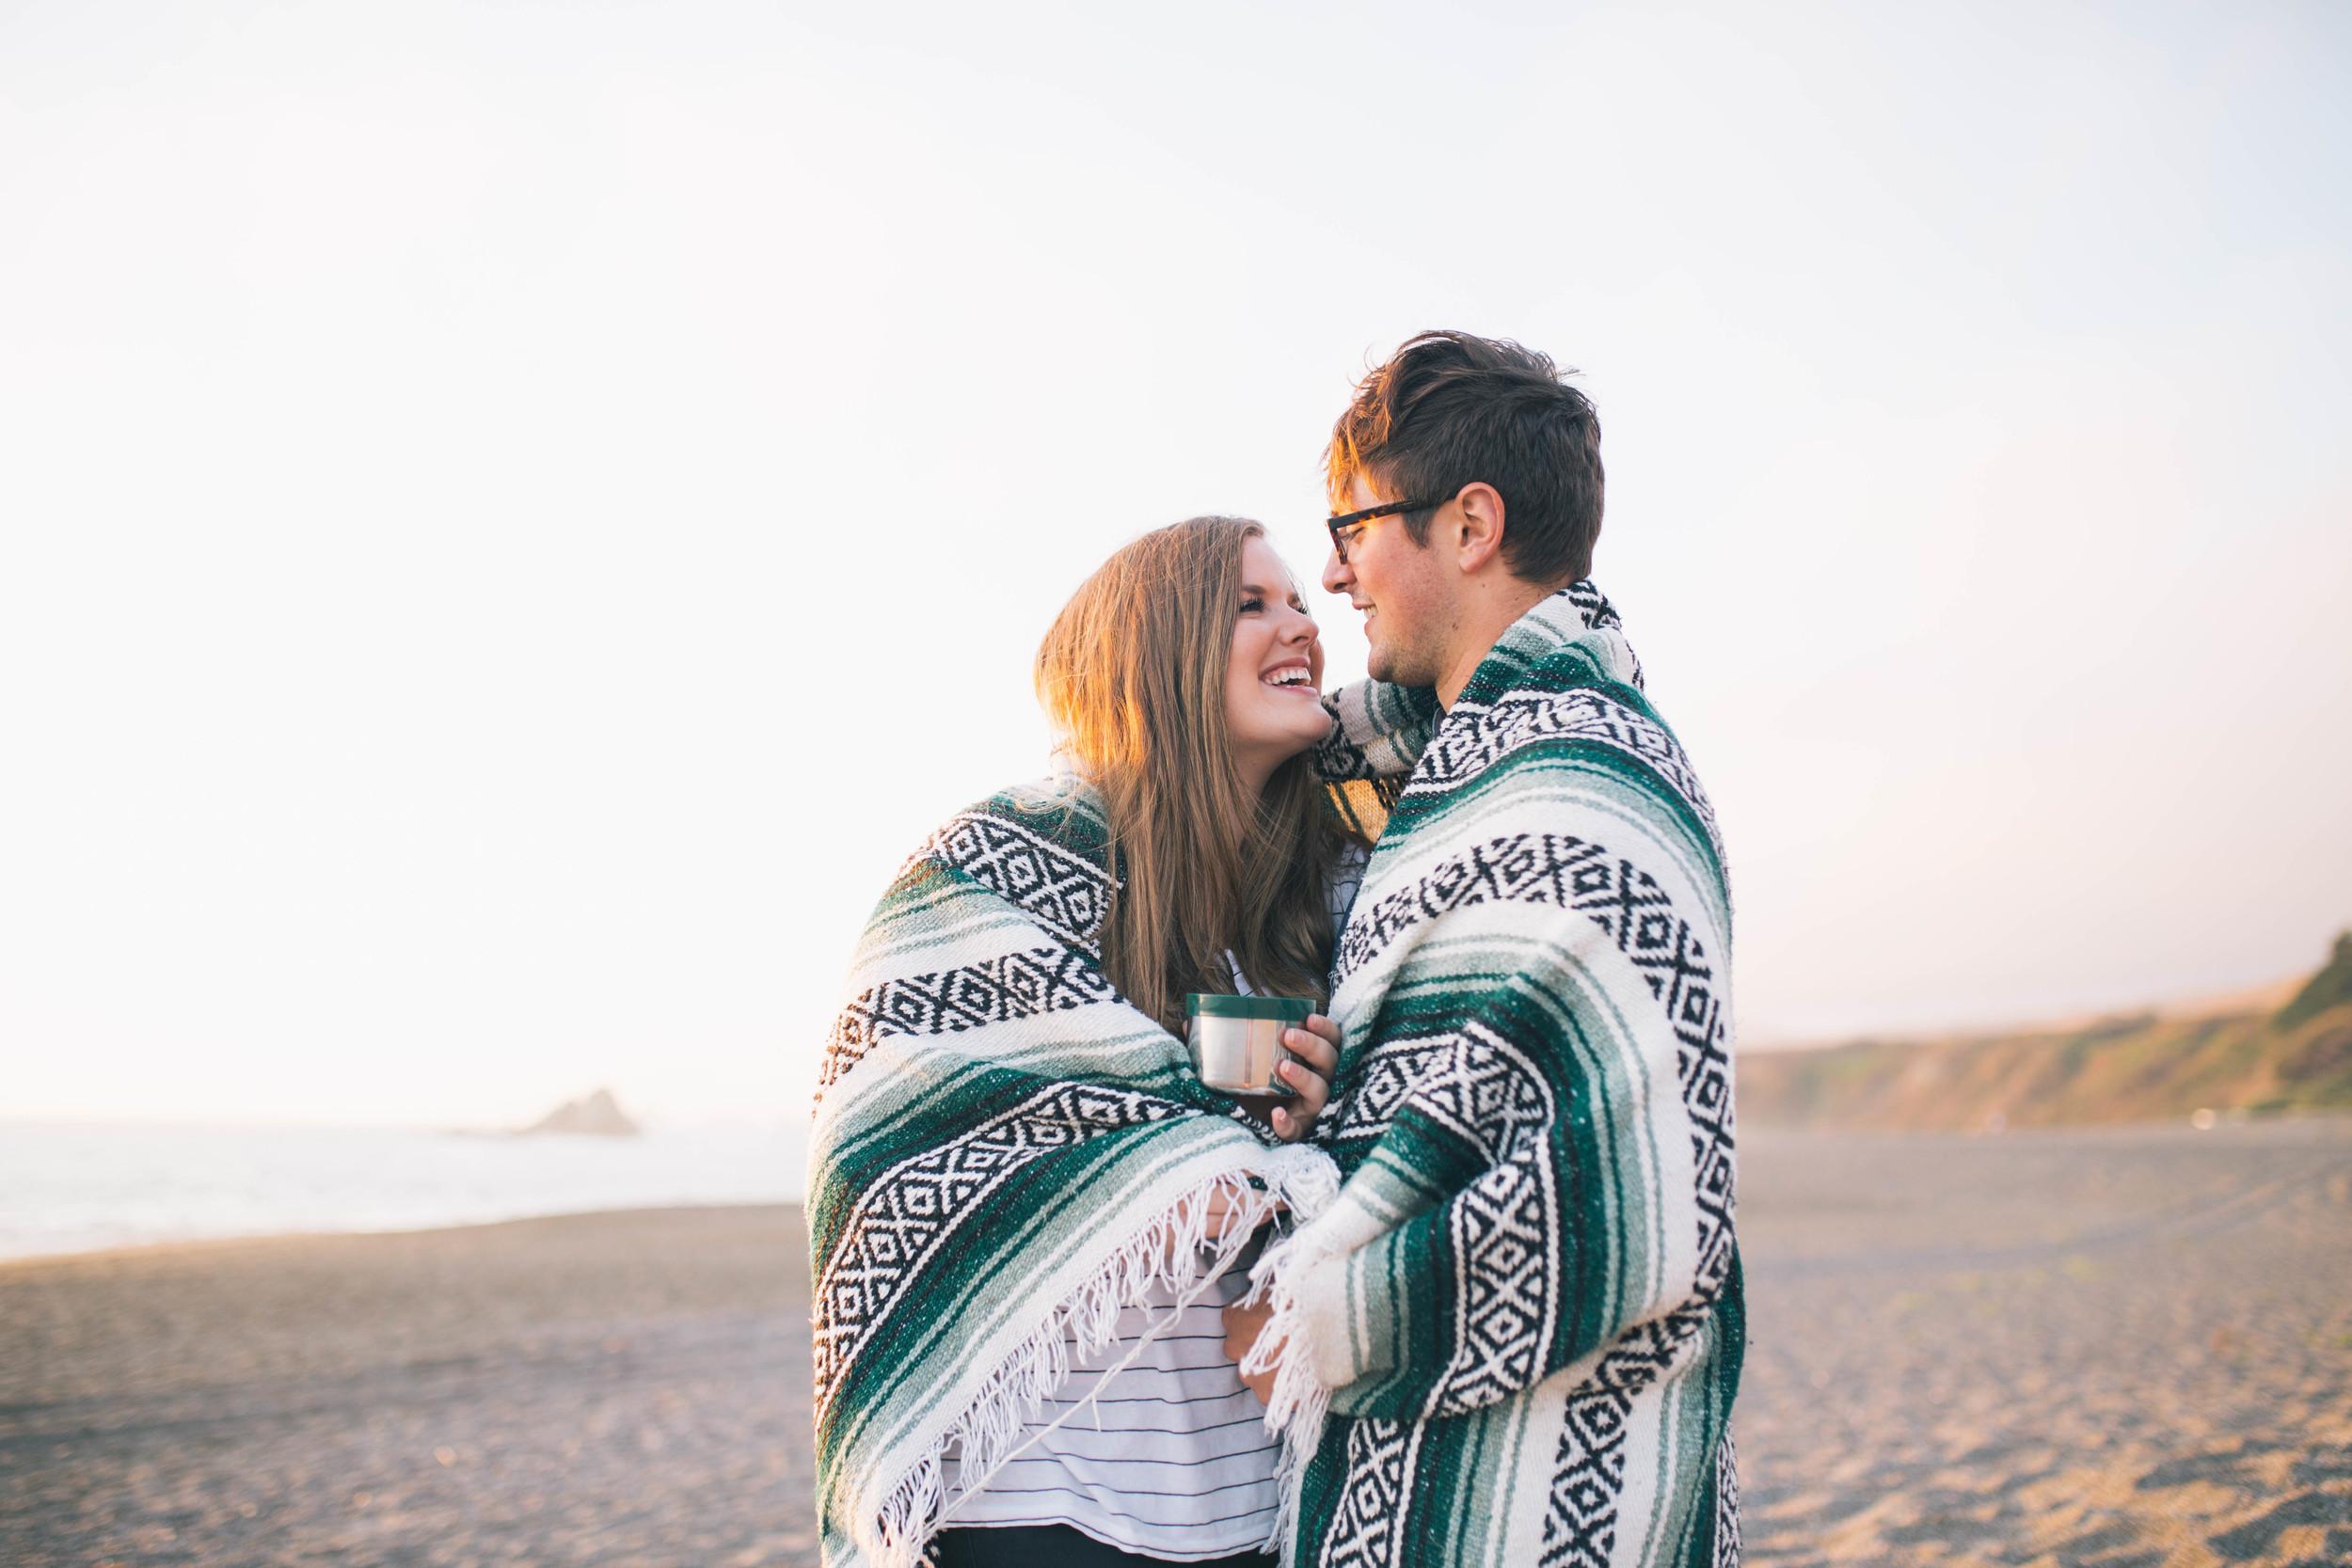 california-beach-couples-portrait-photographer-blanket-sunset